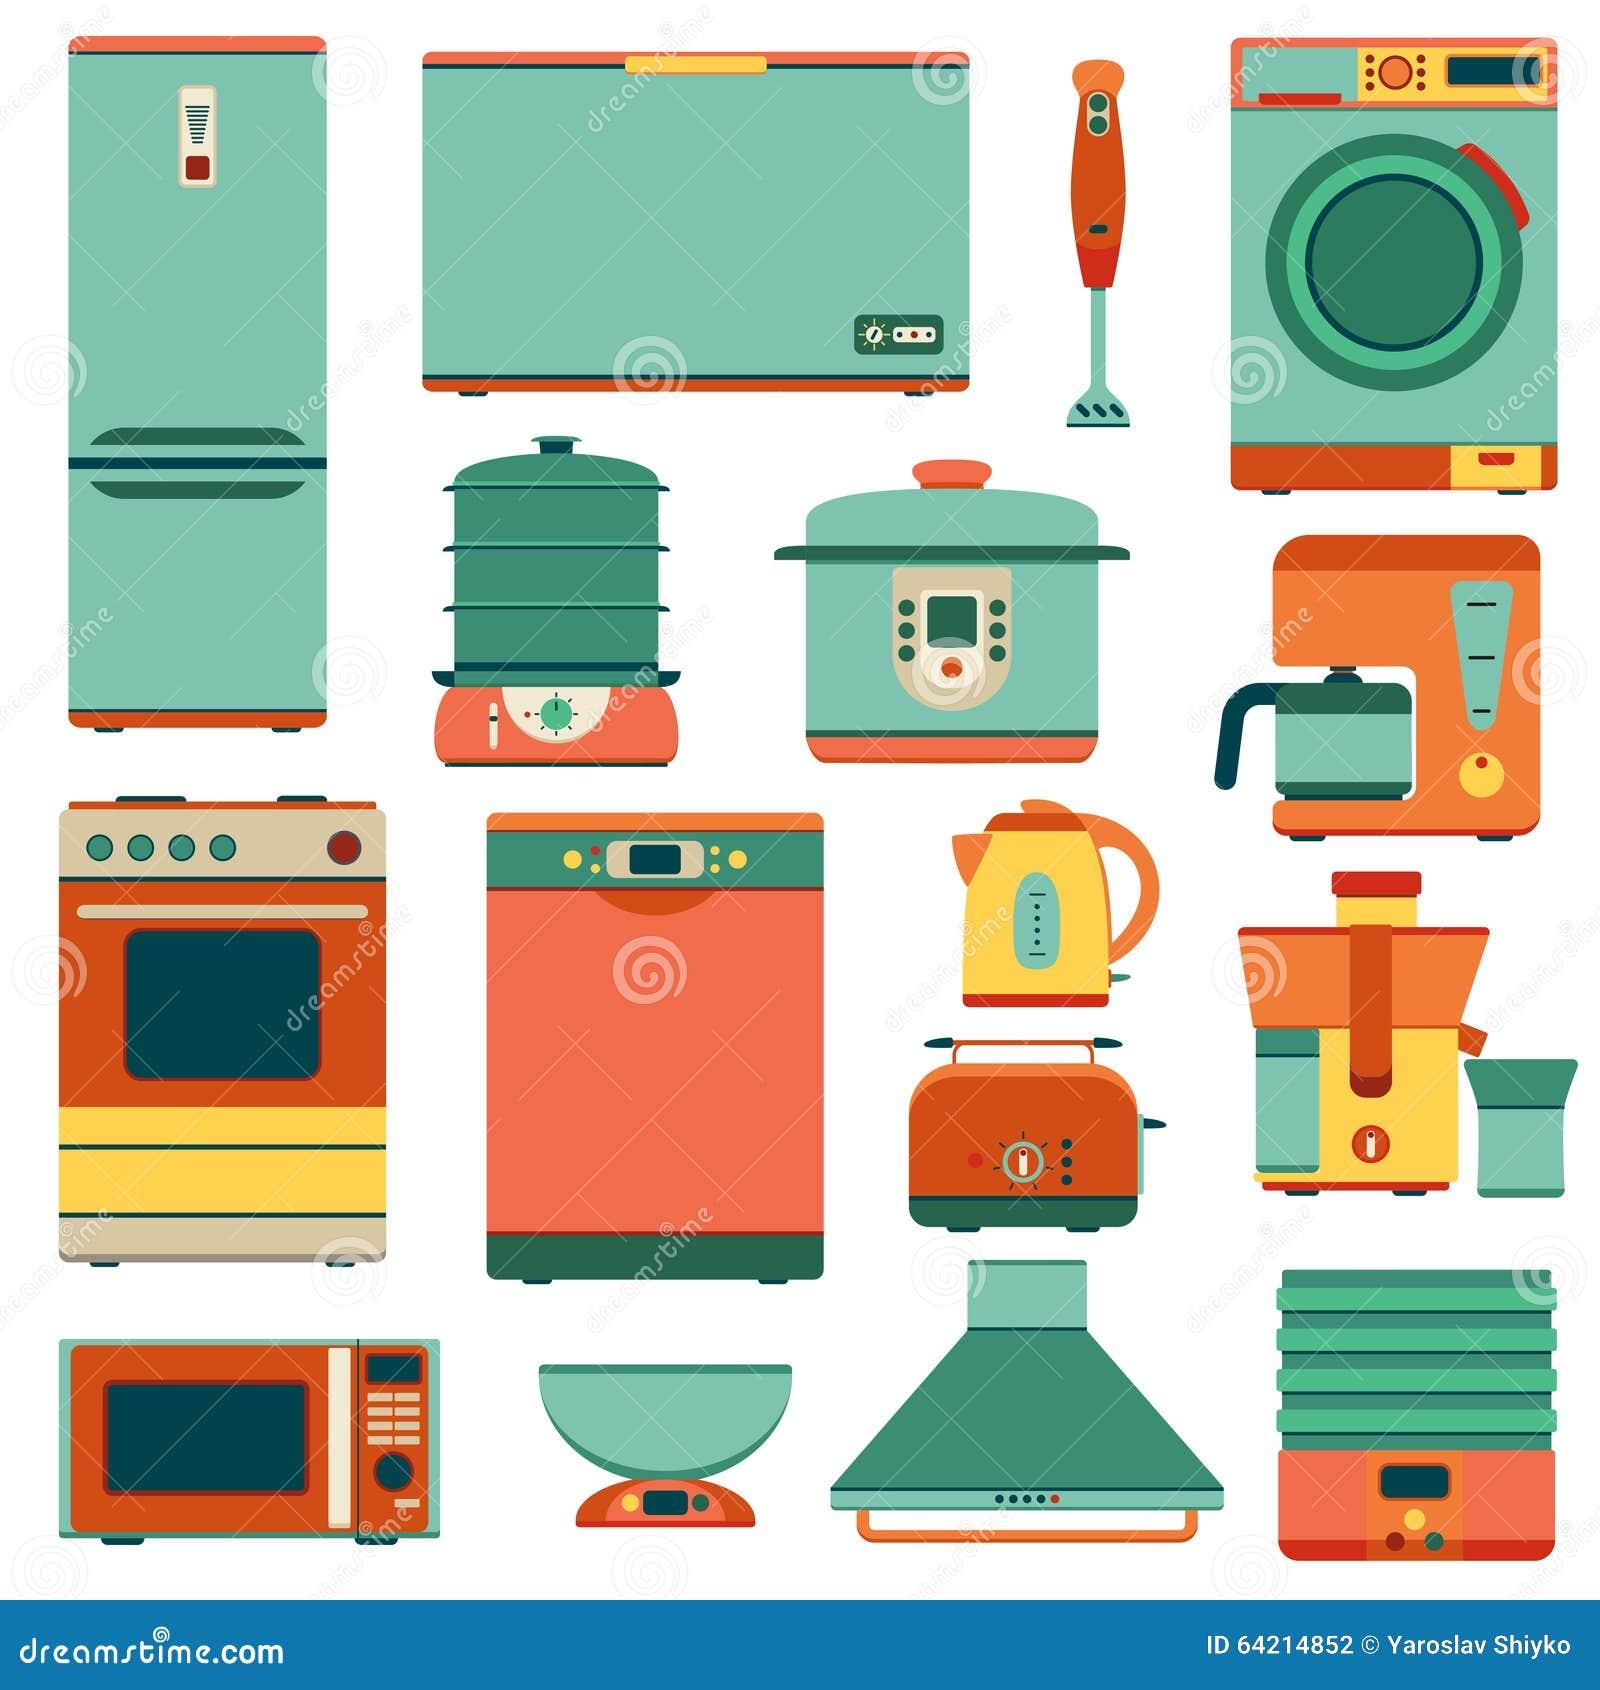 Uncategorized Set Of Kitchen Appliances set of kitchen appliances in flat style stock vector image 64214852 style